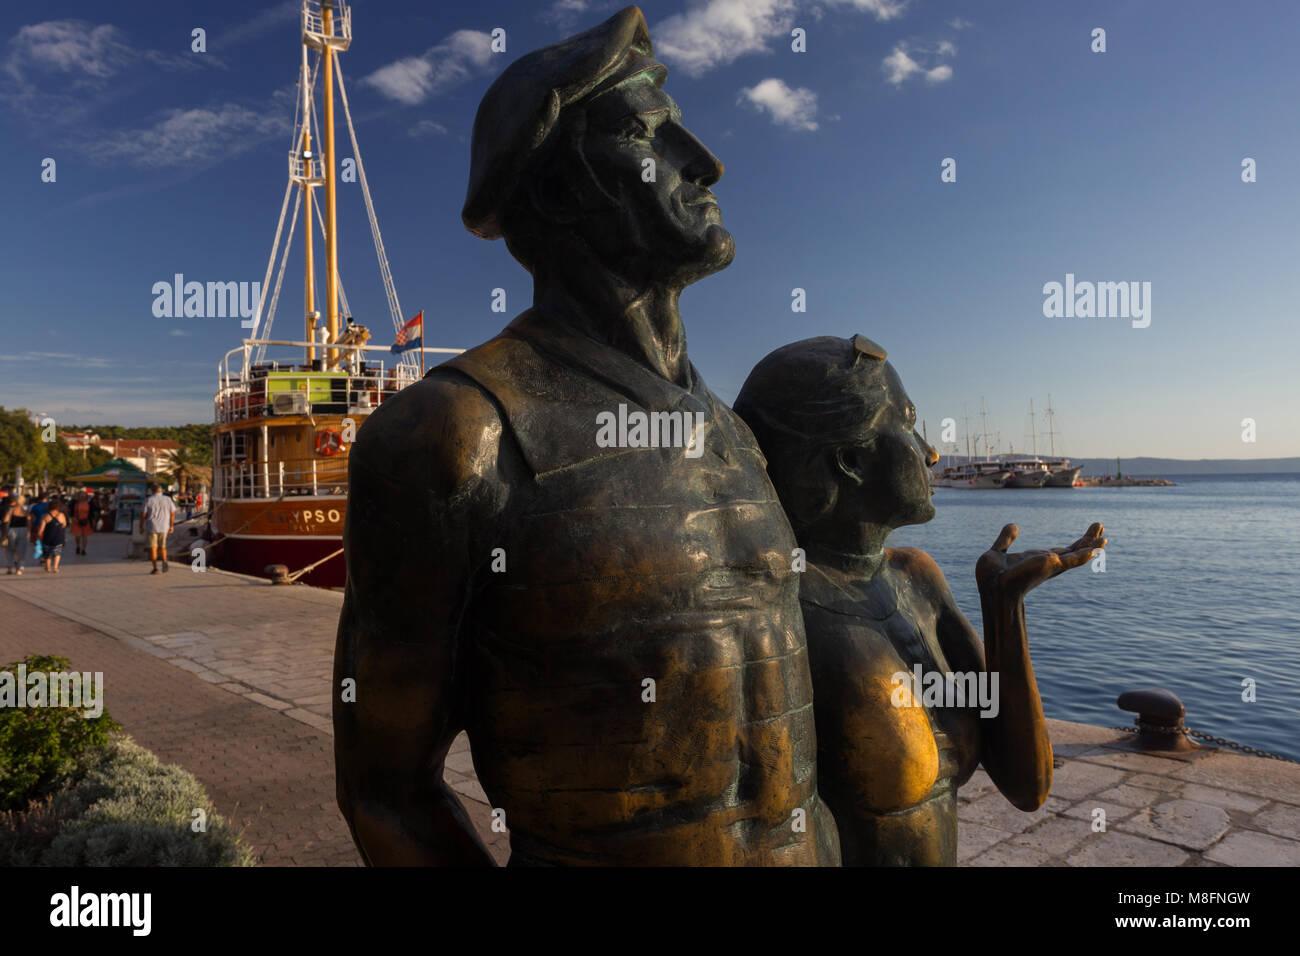 Monument of a tourist in town Makarska, Dalmatia, Croatia Stock Photo